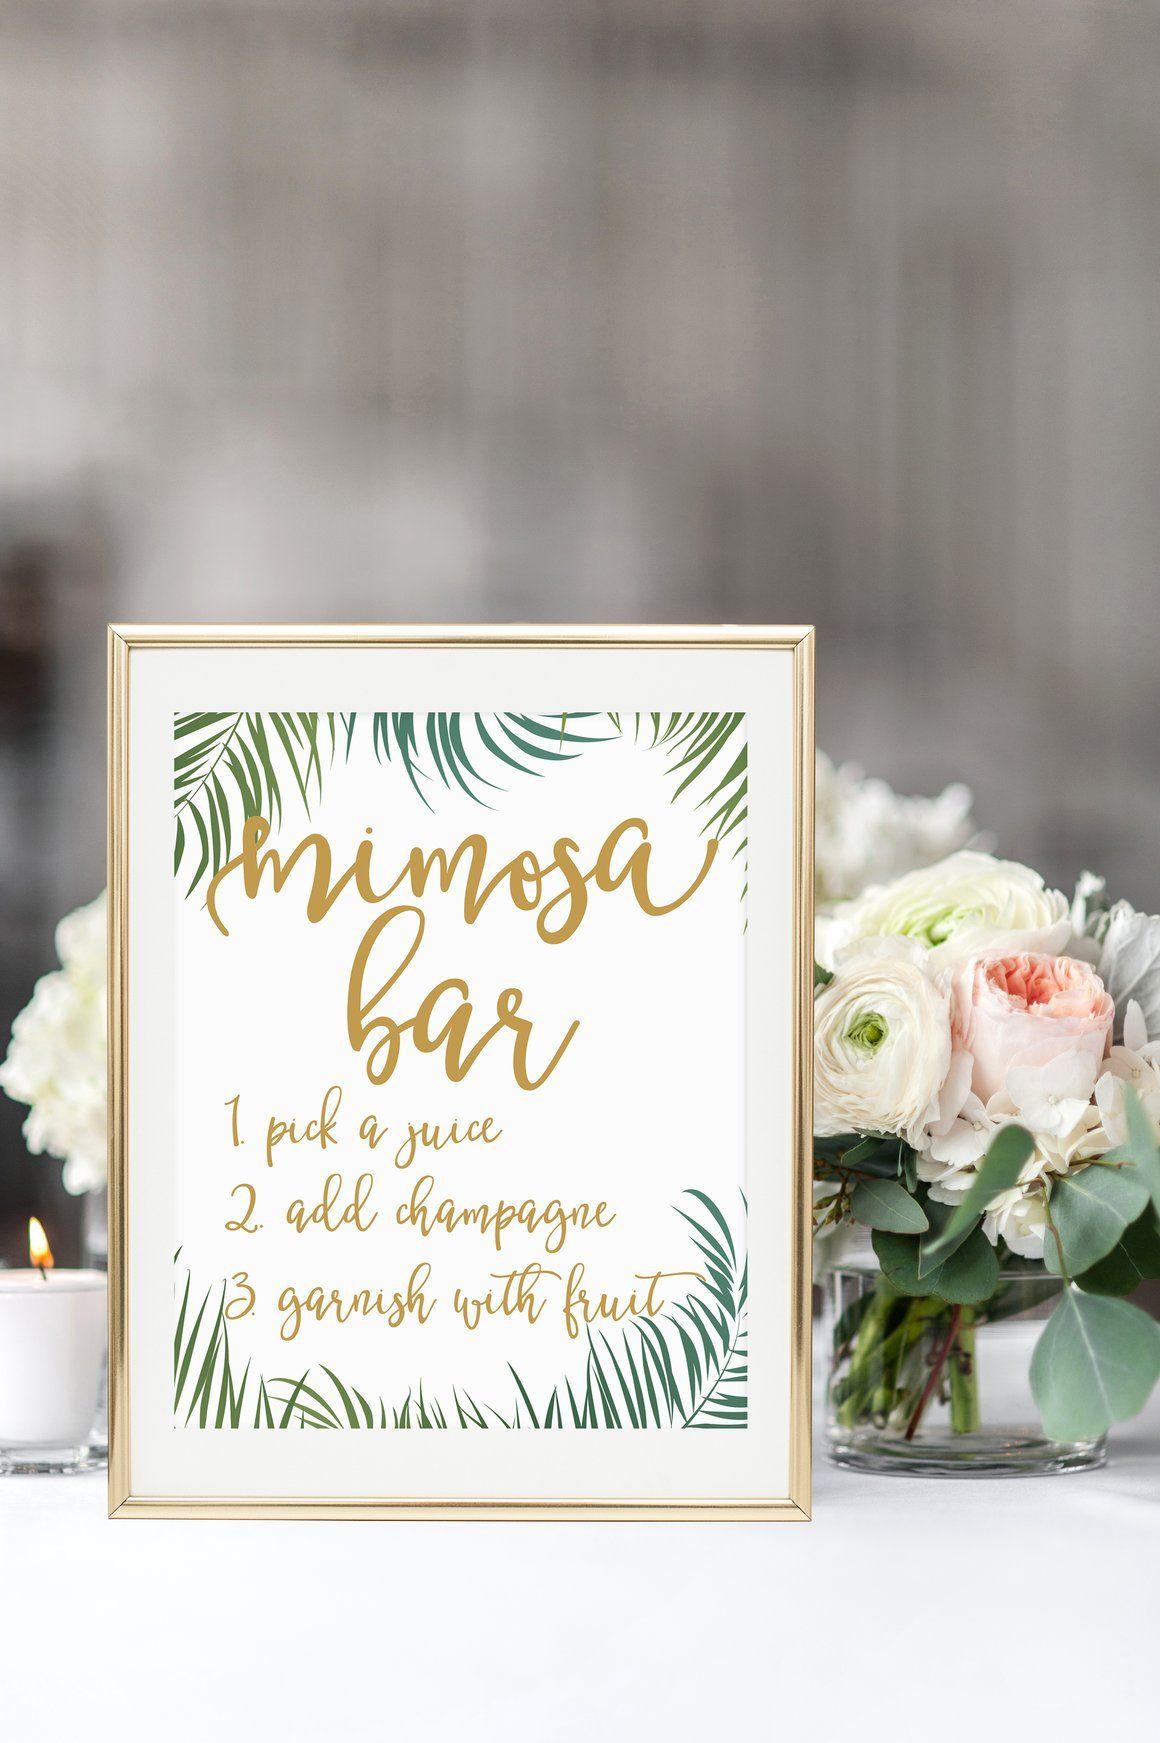 Mimosa Bar Sign - Tropical Printable #babyshowerideas